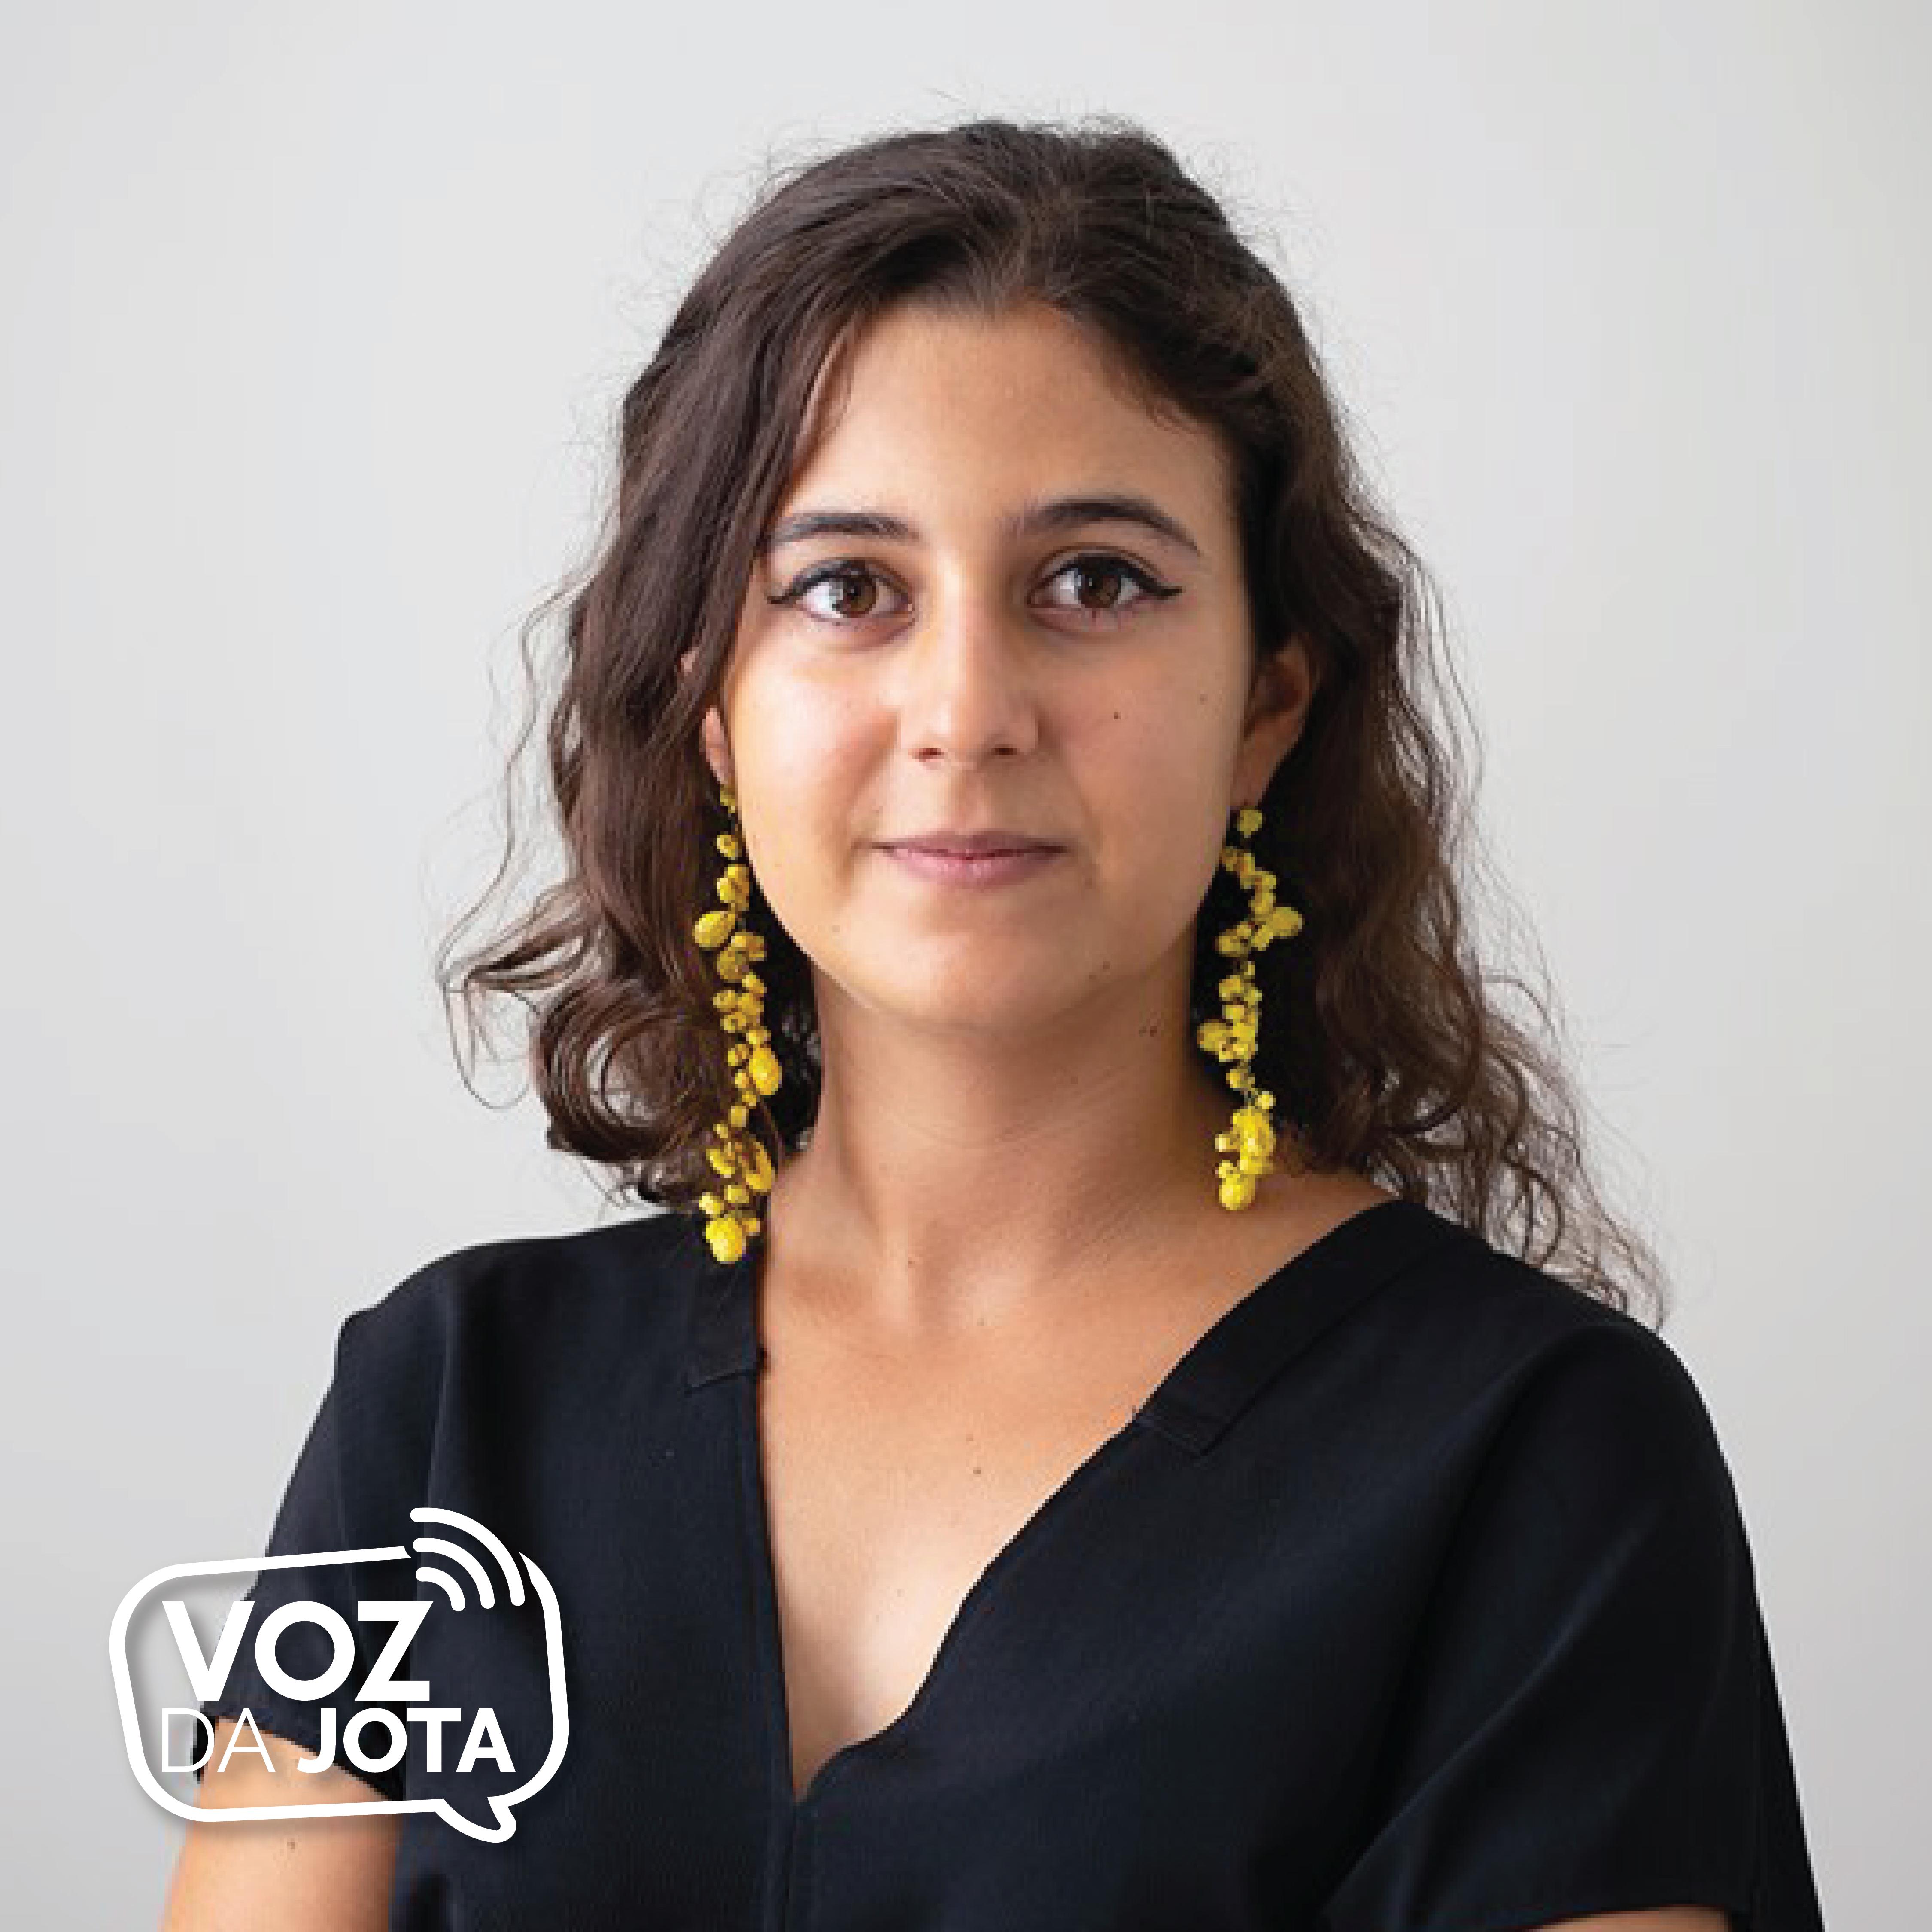 Maria_Pereira_vozdajota_site